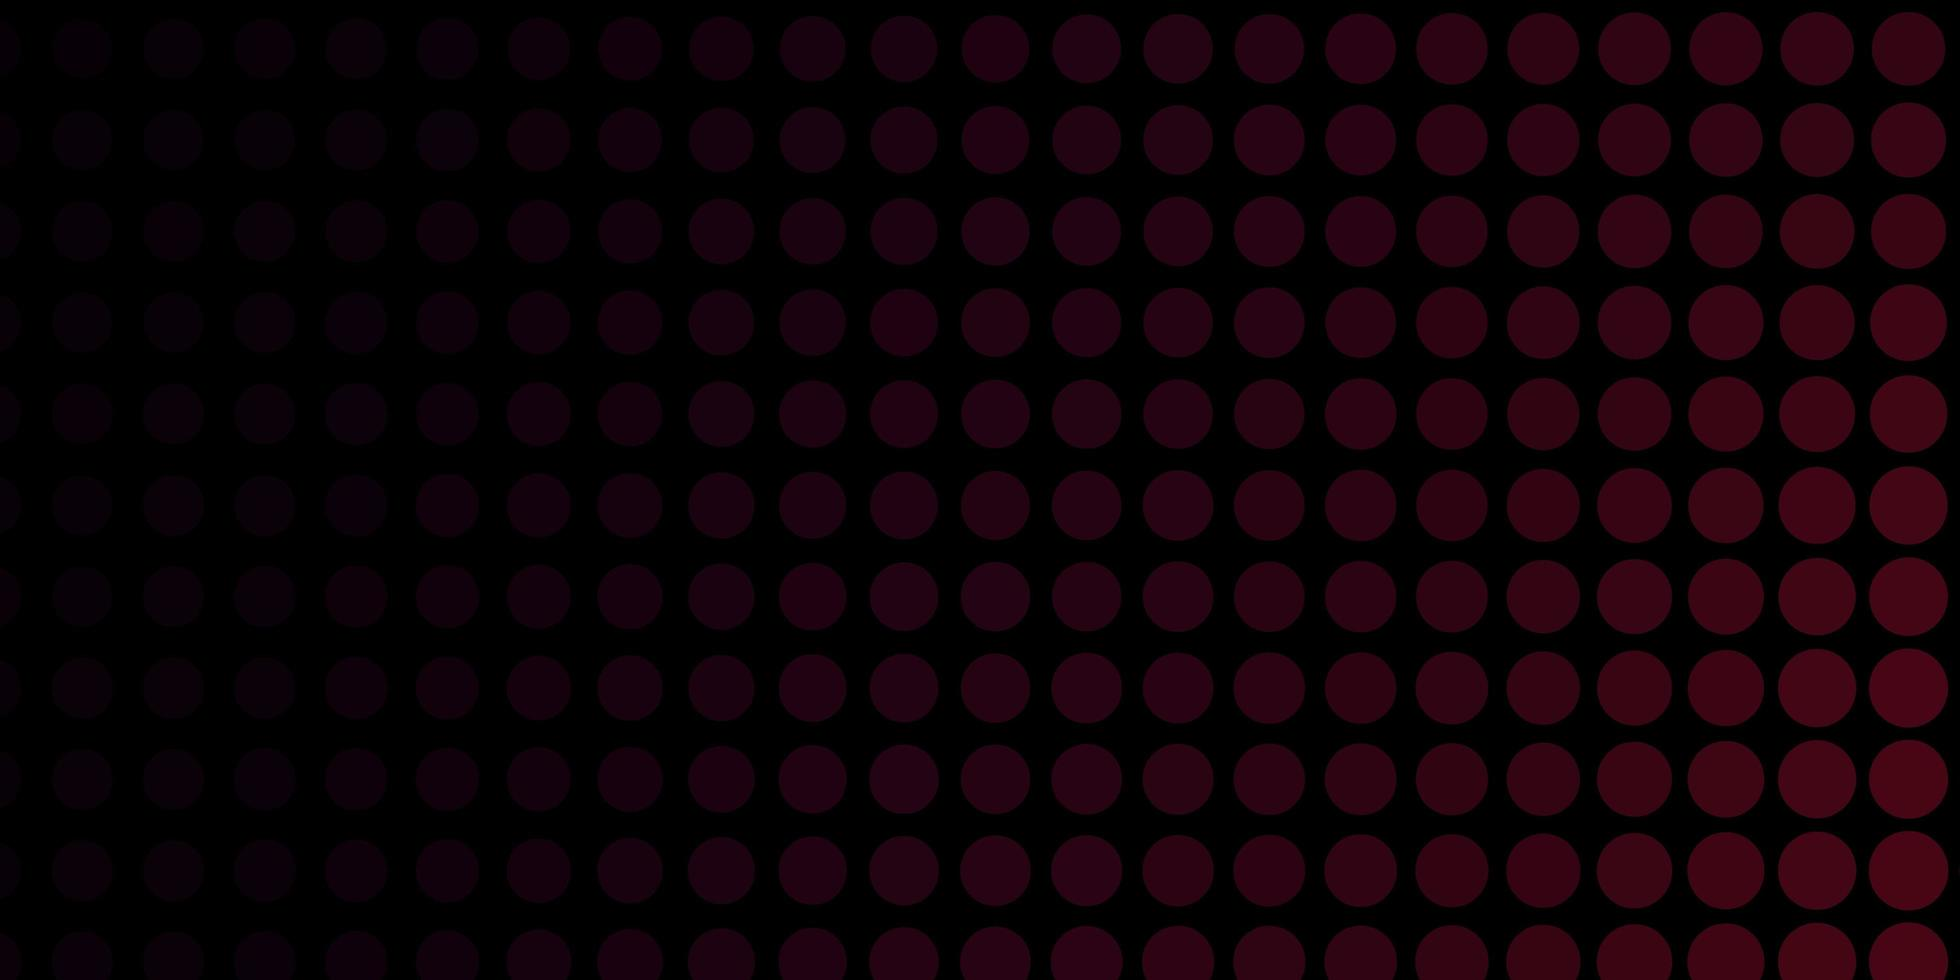 telón de fondo rojo oscuro con círculos. vector